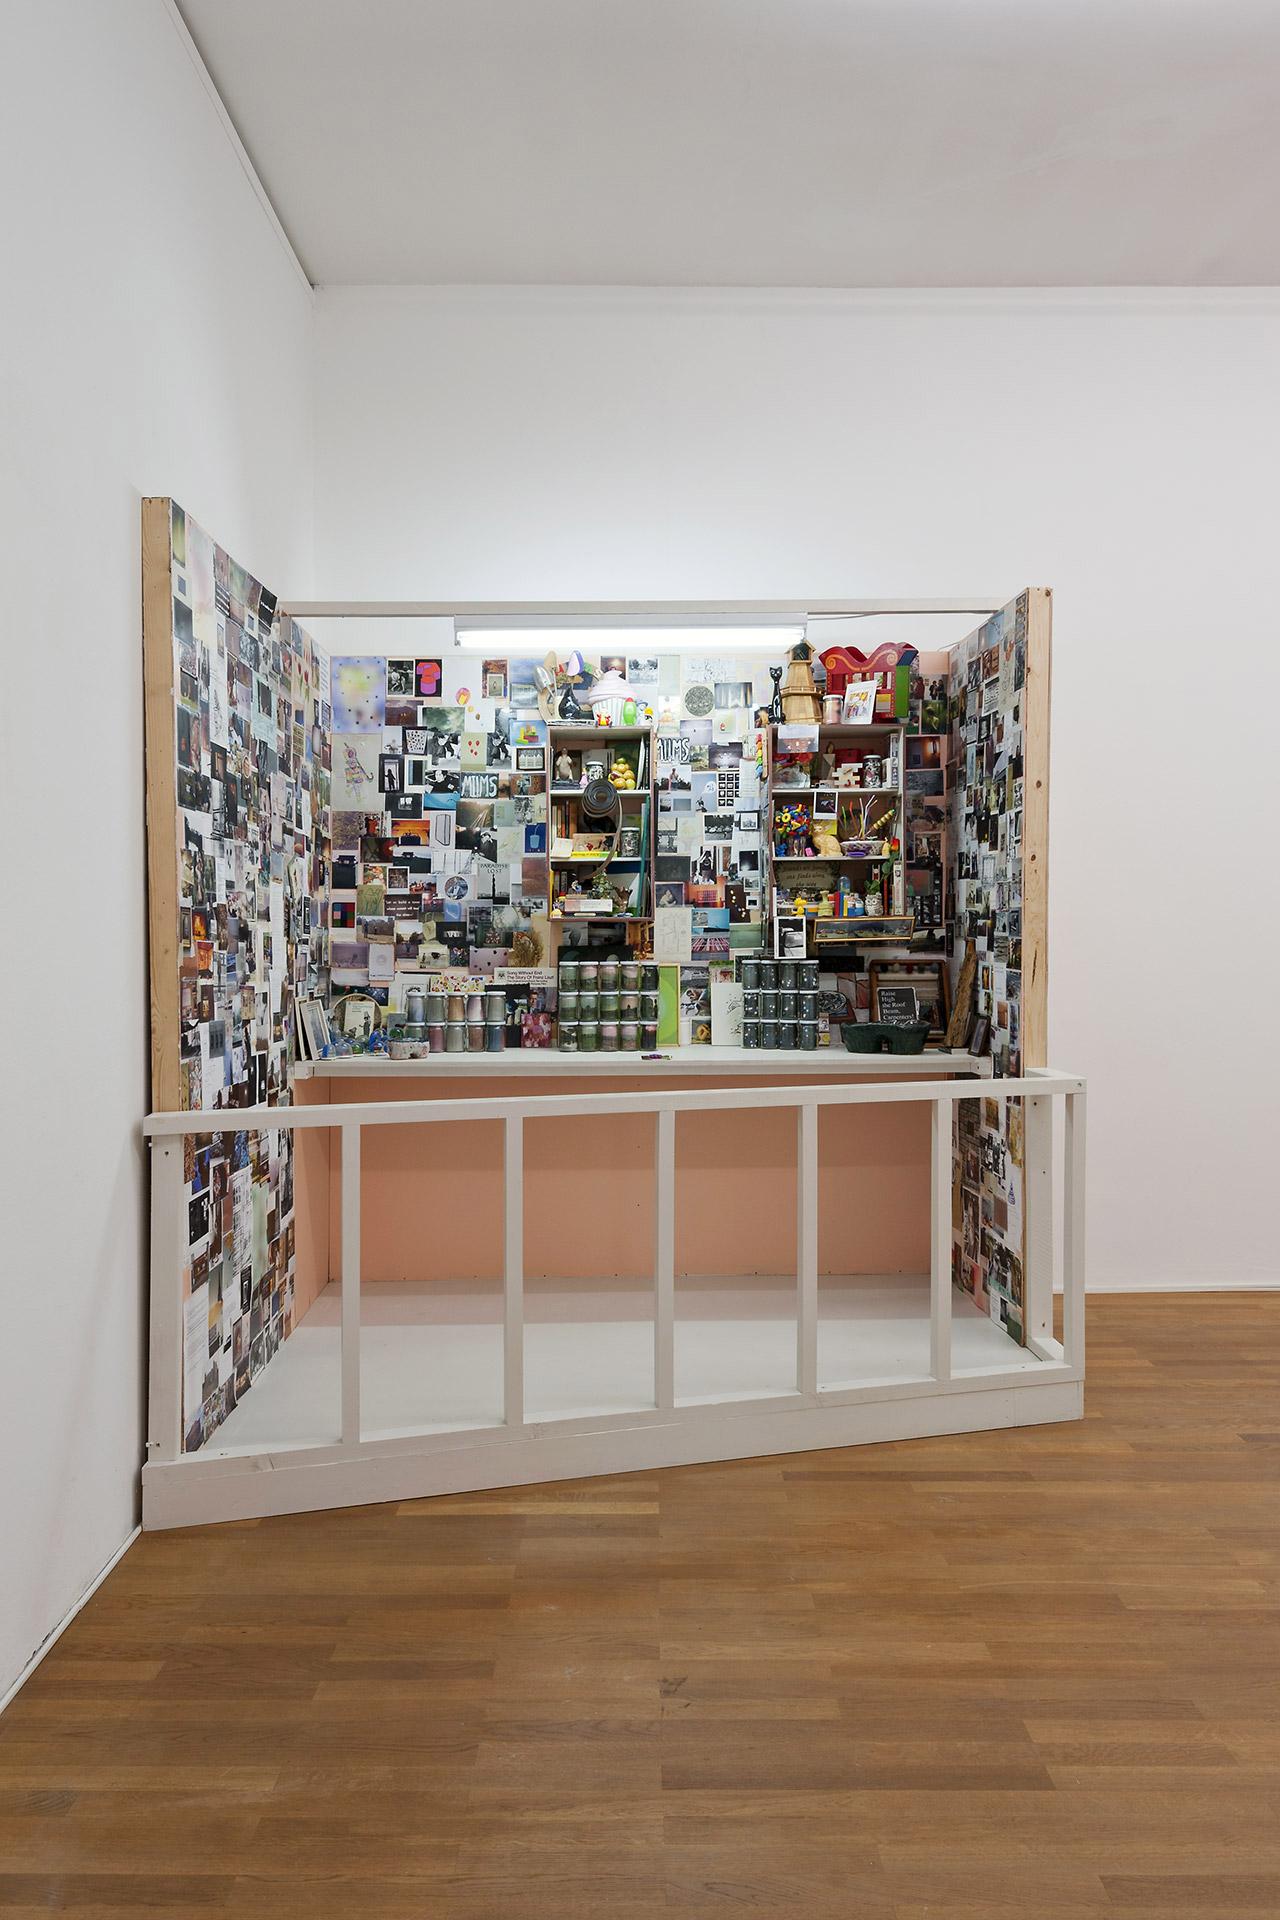 Andy-Holden-Kunsthalle-Winterthur-2015-4.jpg